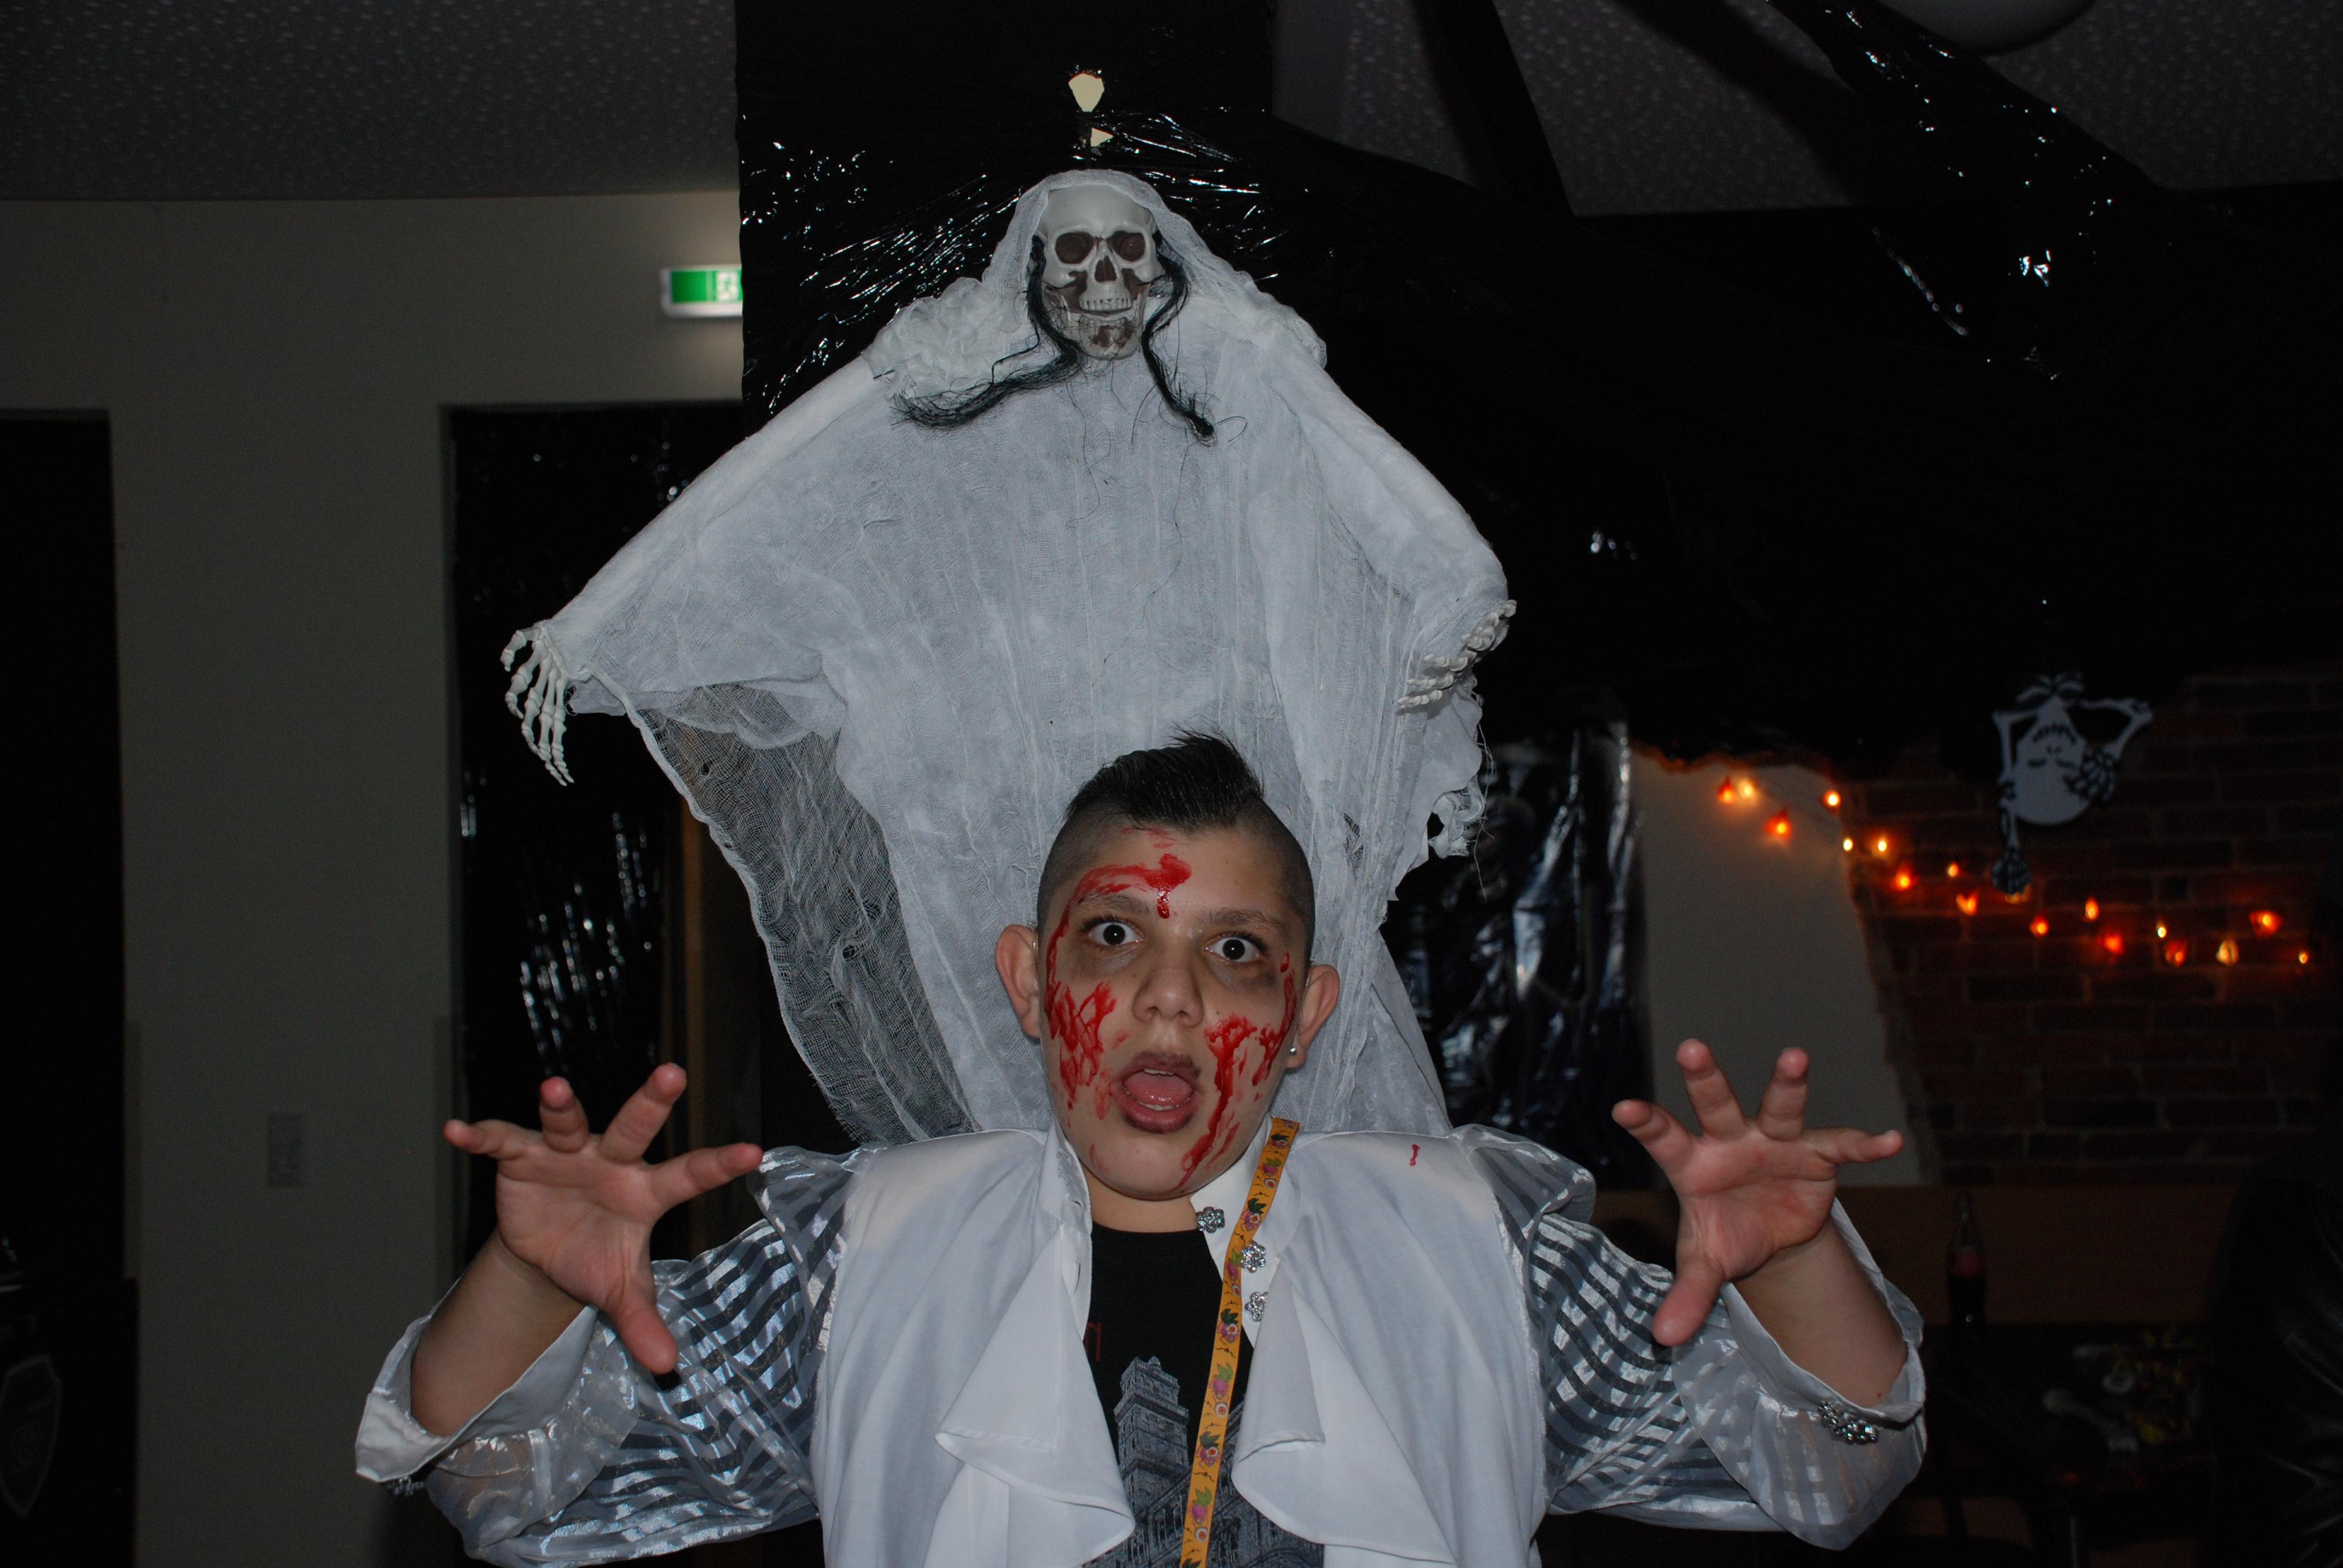 Halloween-Party in Kooperation mit dem Bürgerverein Bloherfelde ...